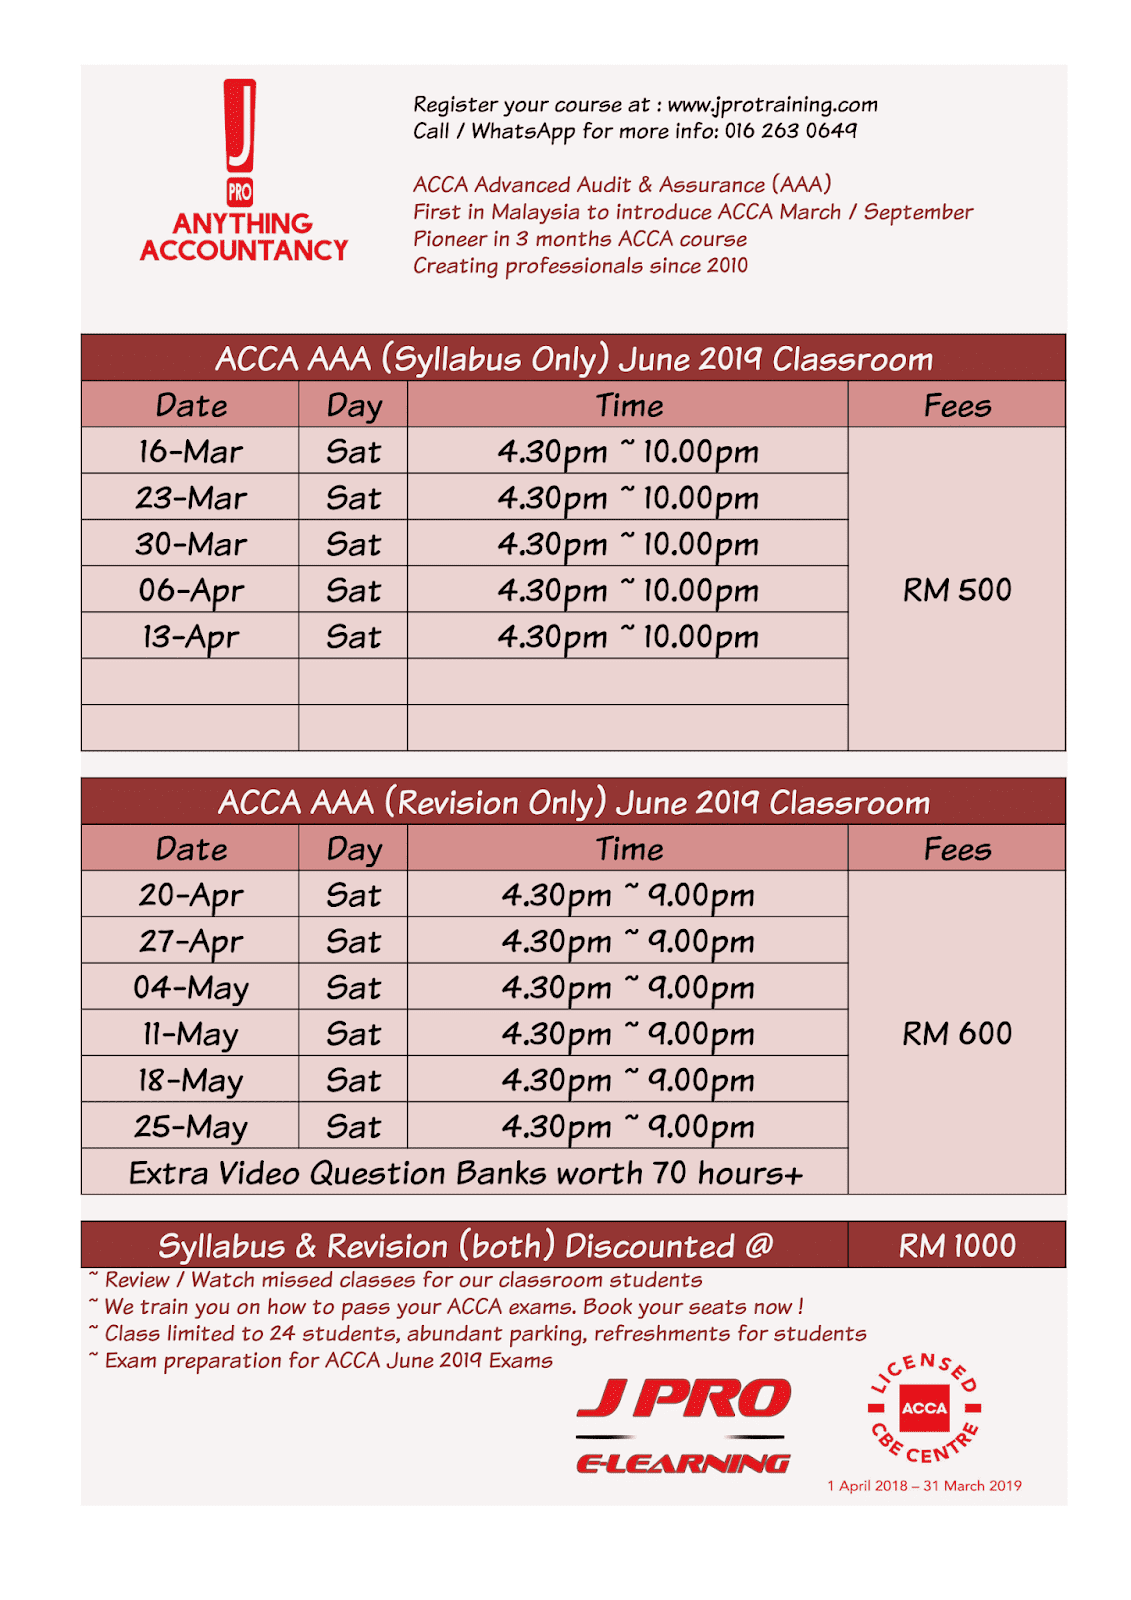 J Pro Business Training: ACCA JUNE 2019 EXAM PREPARATION